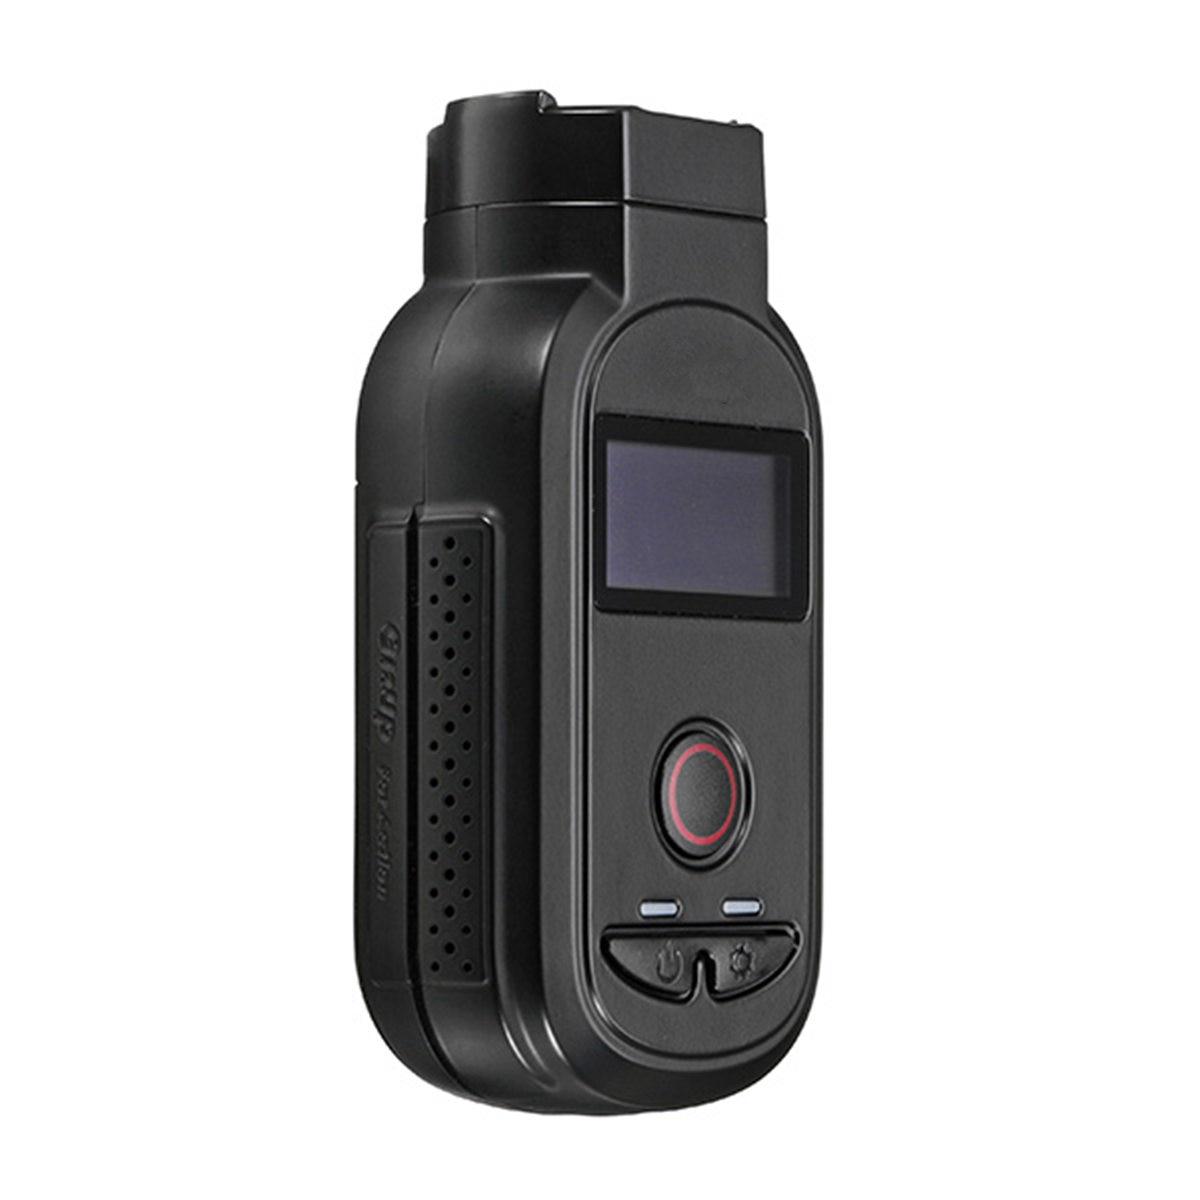 Professional Mini Portable 4K 5.8G 2.4G Wide Angle WIFI Camera PWM For Remote Control Consumer Camcorder